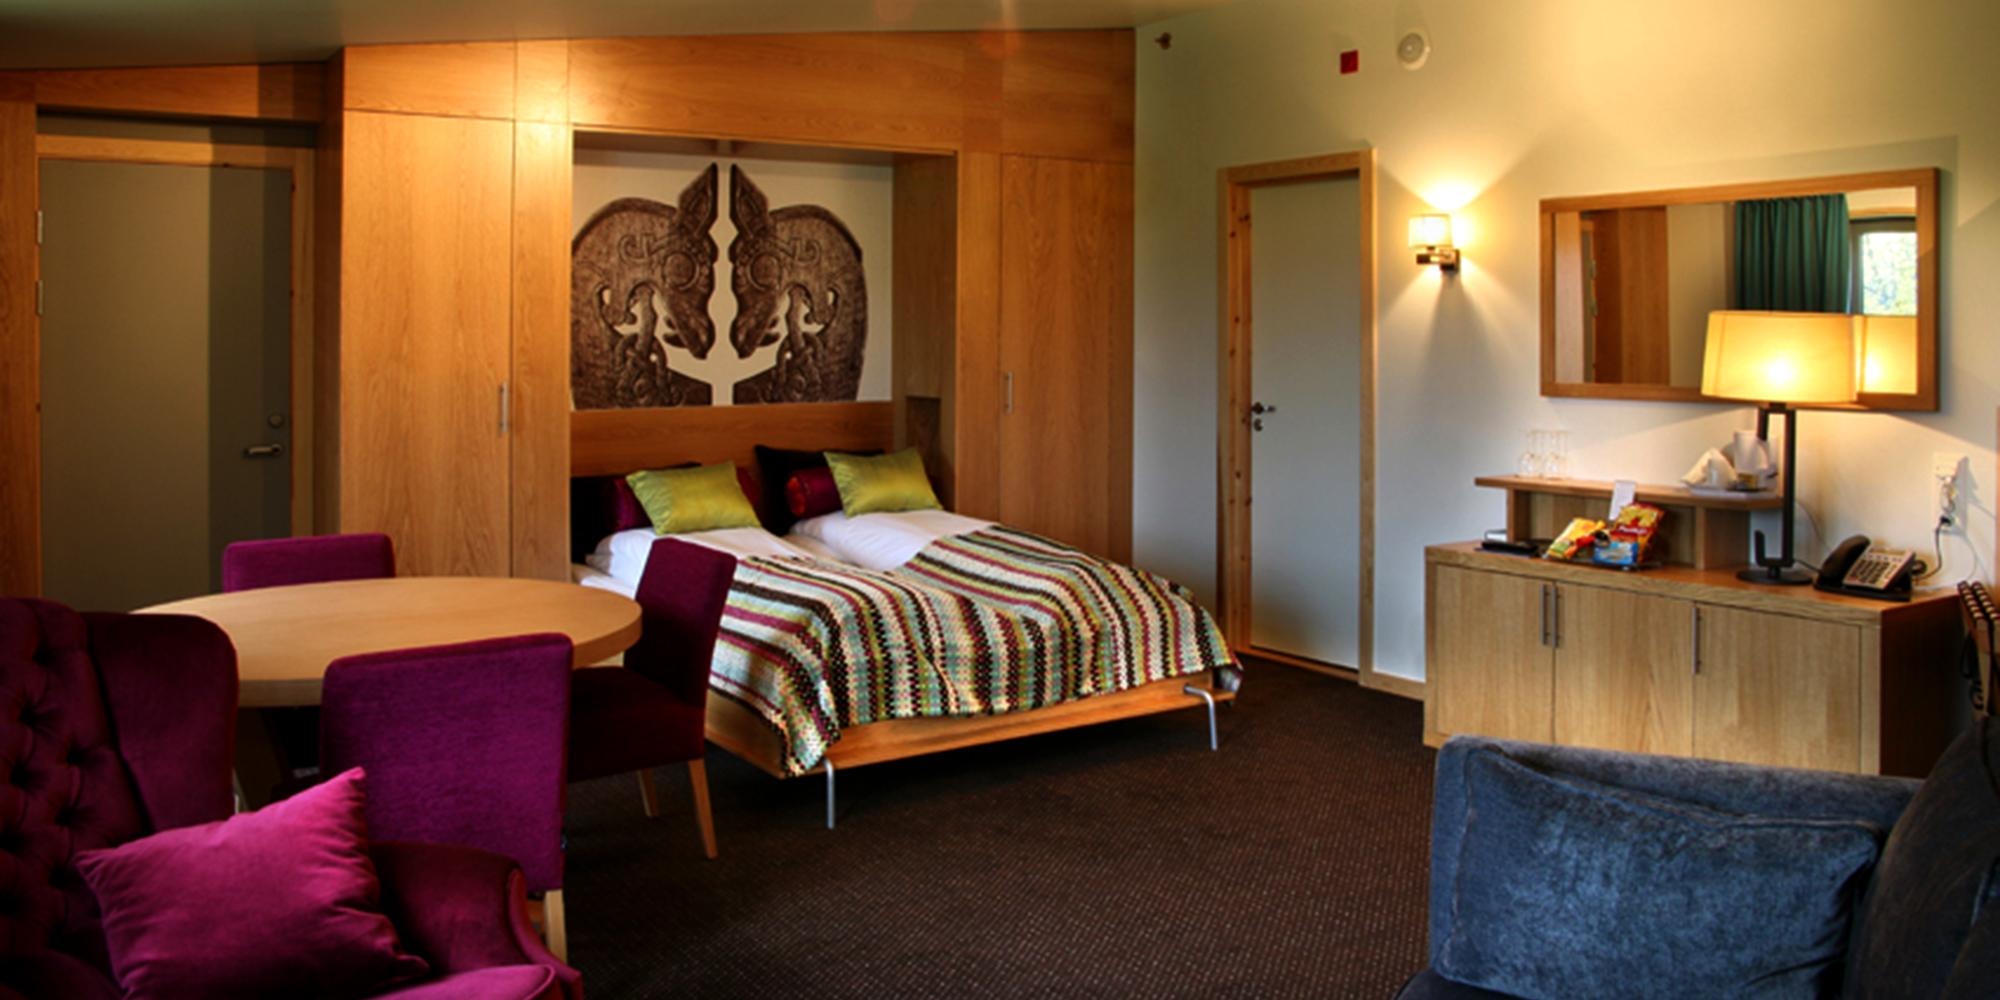 Stiklestad Hotell - suite. Copyright: Stiklestad Hotell